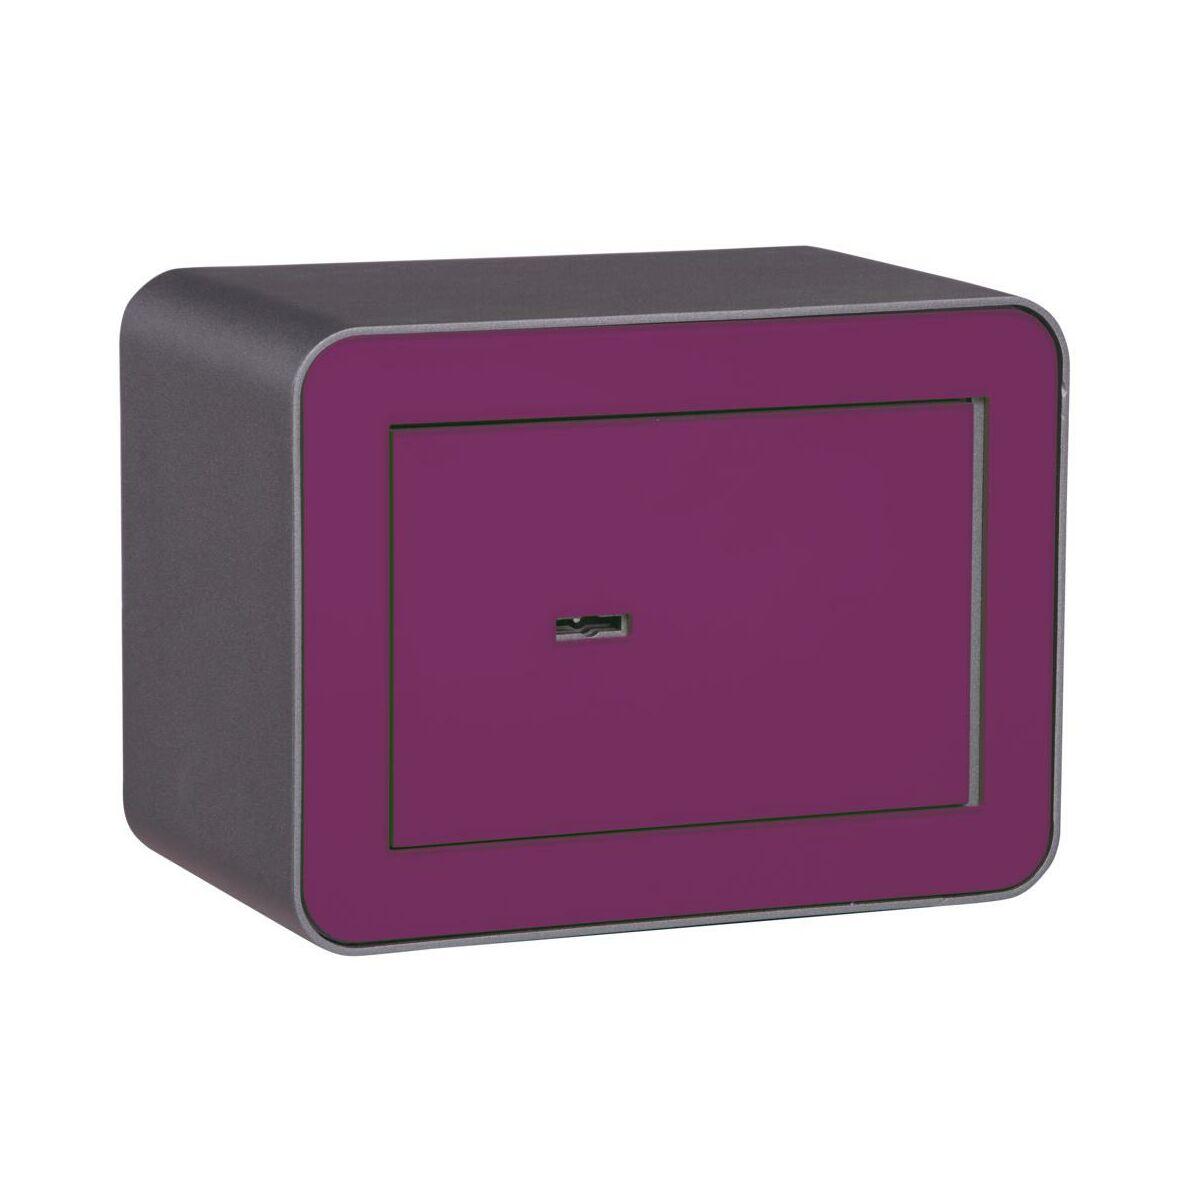 sejf tg slm2classic szyba fiolet metalkas sejfy w. Black Bedroom Furniture Sets. Home Design Ideas